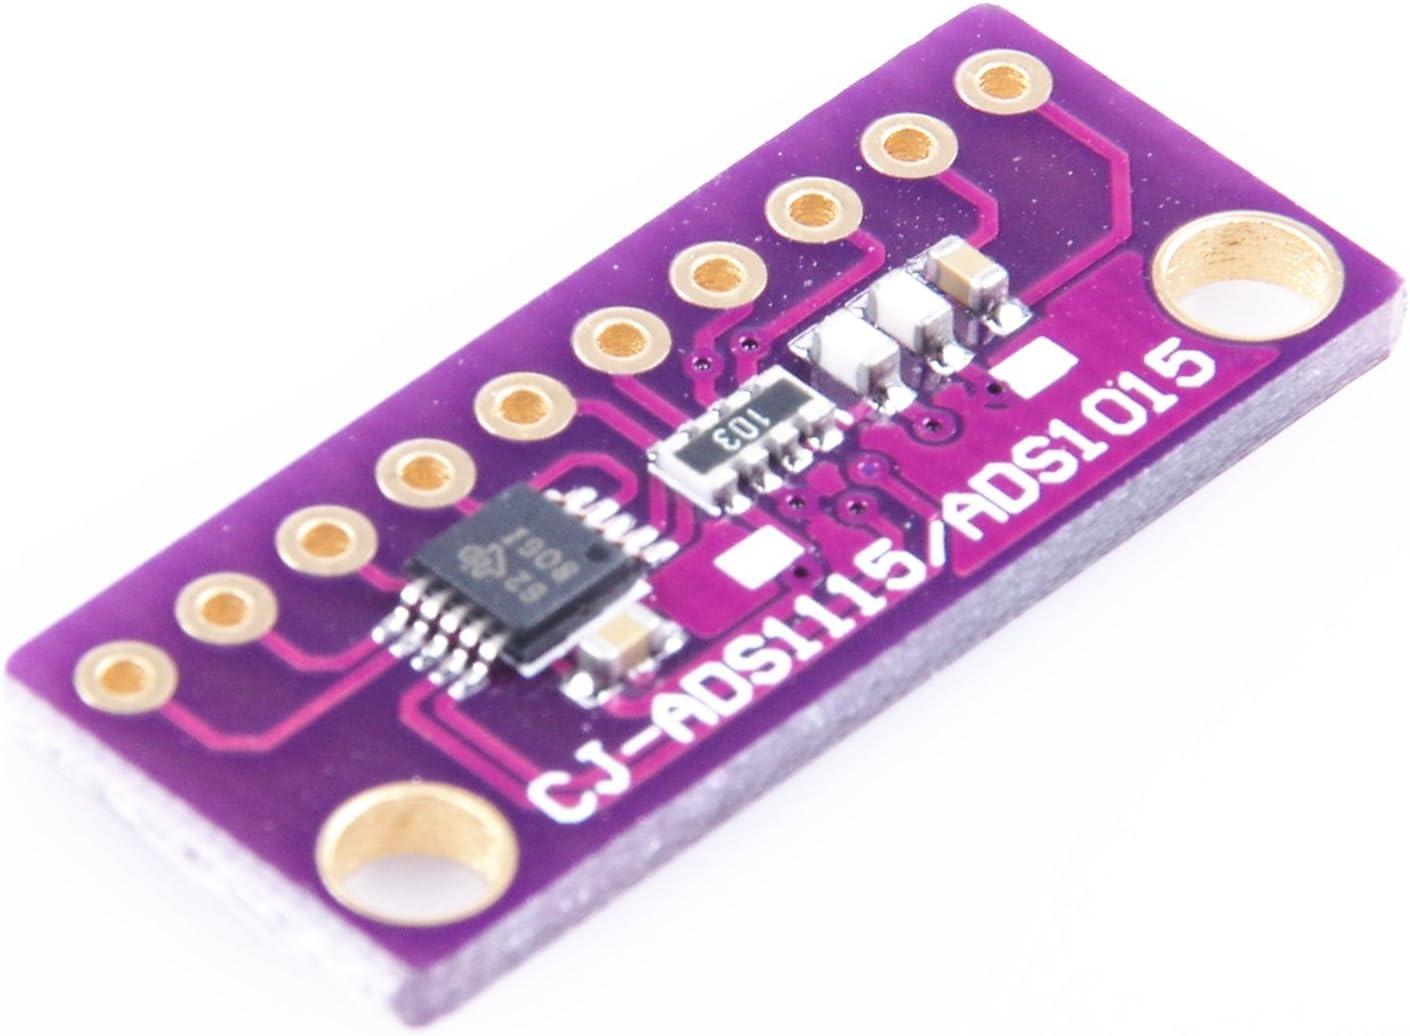 KNACRO ADS1015 ADS1115 16 bit 4 Channel Precision Analog-to-Digital Converter ADC Development Board